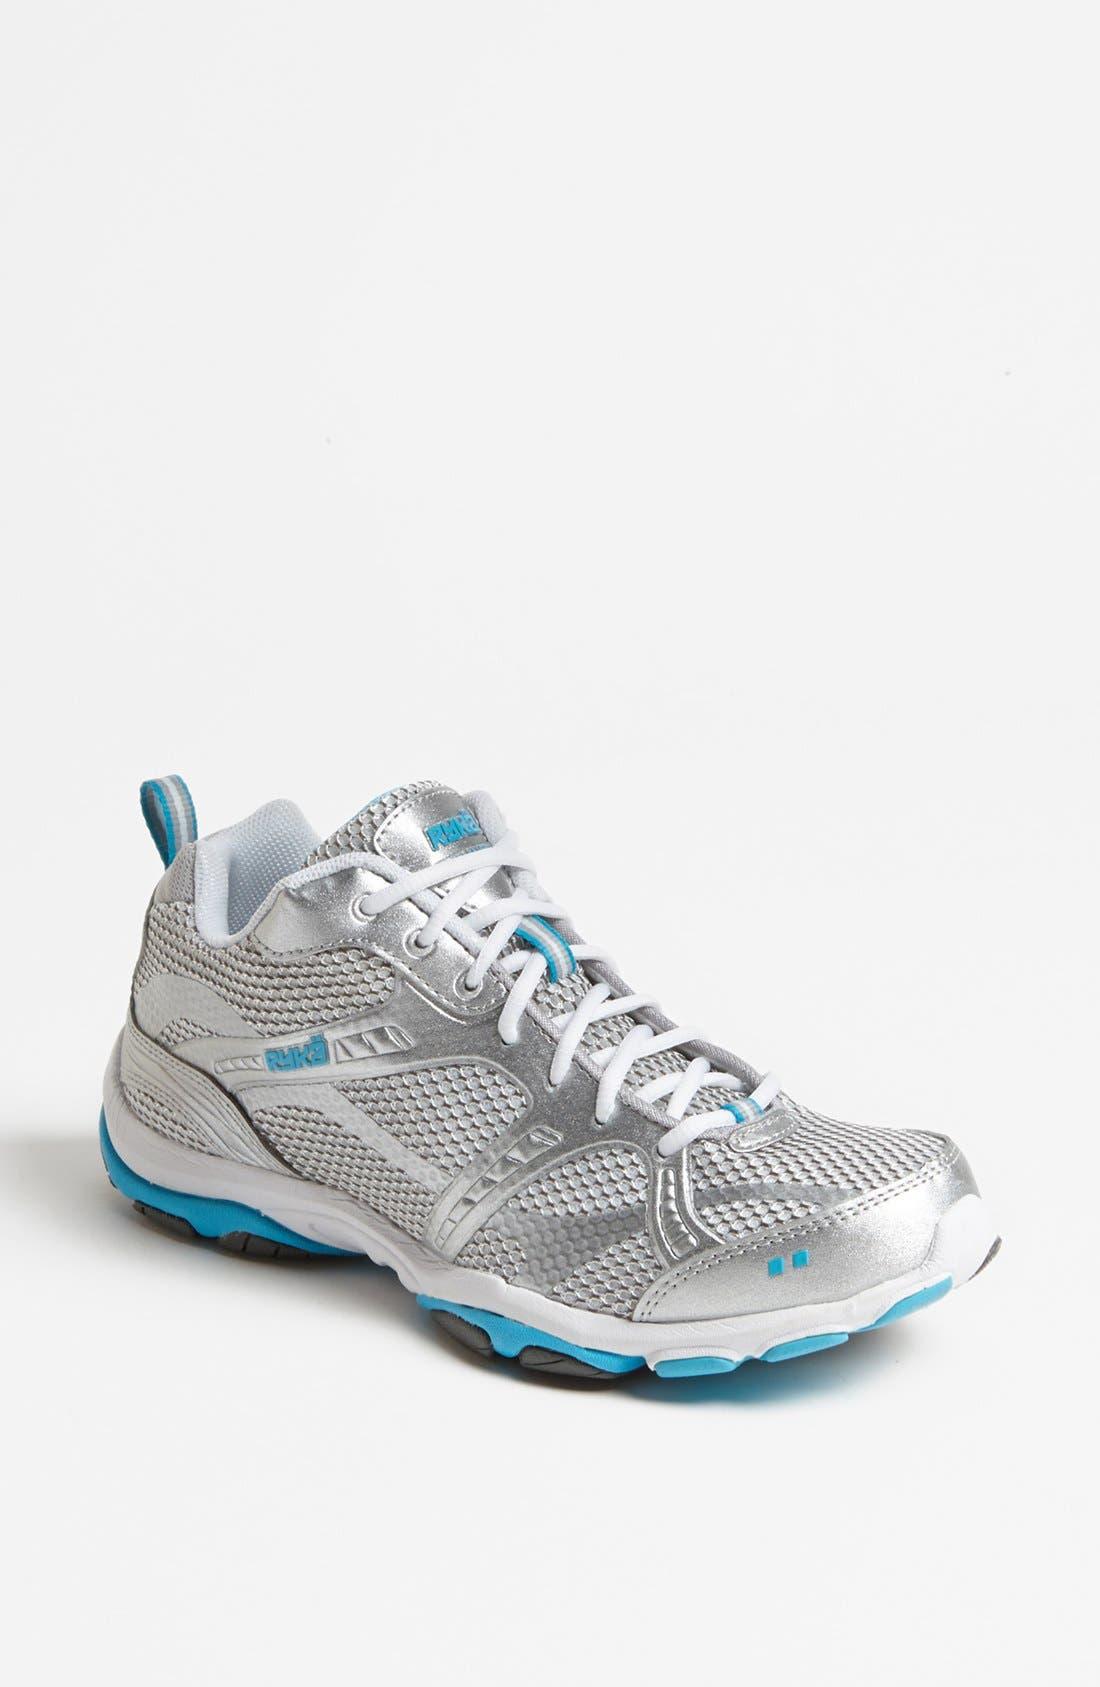 Main Image - rykä 'Enhance 2' Training Shoe (Women)